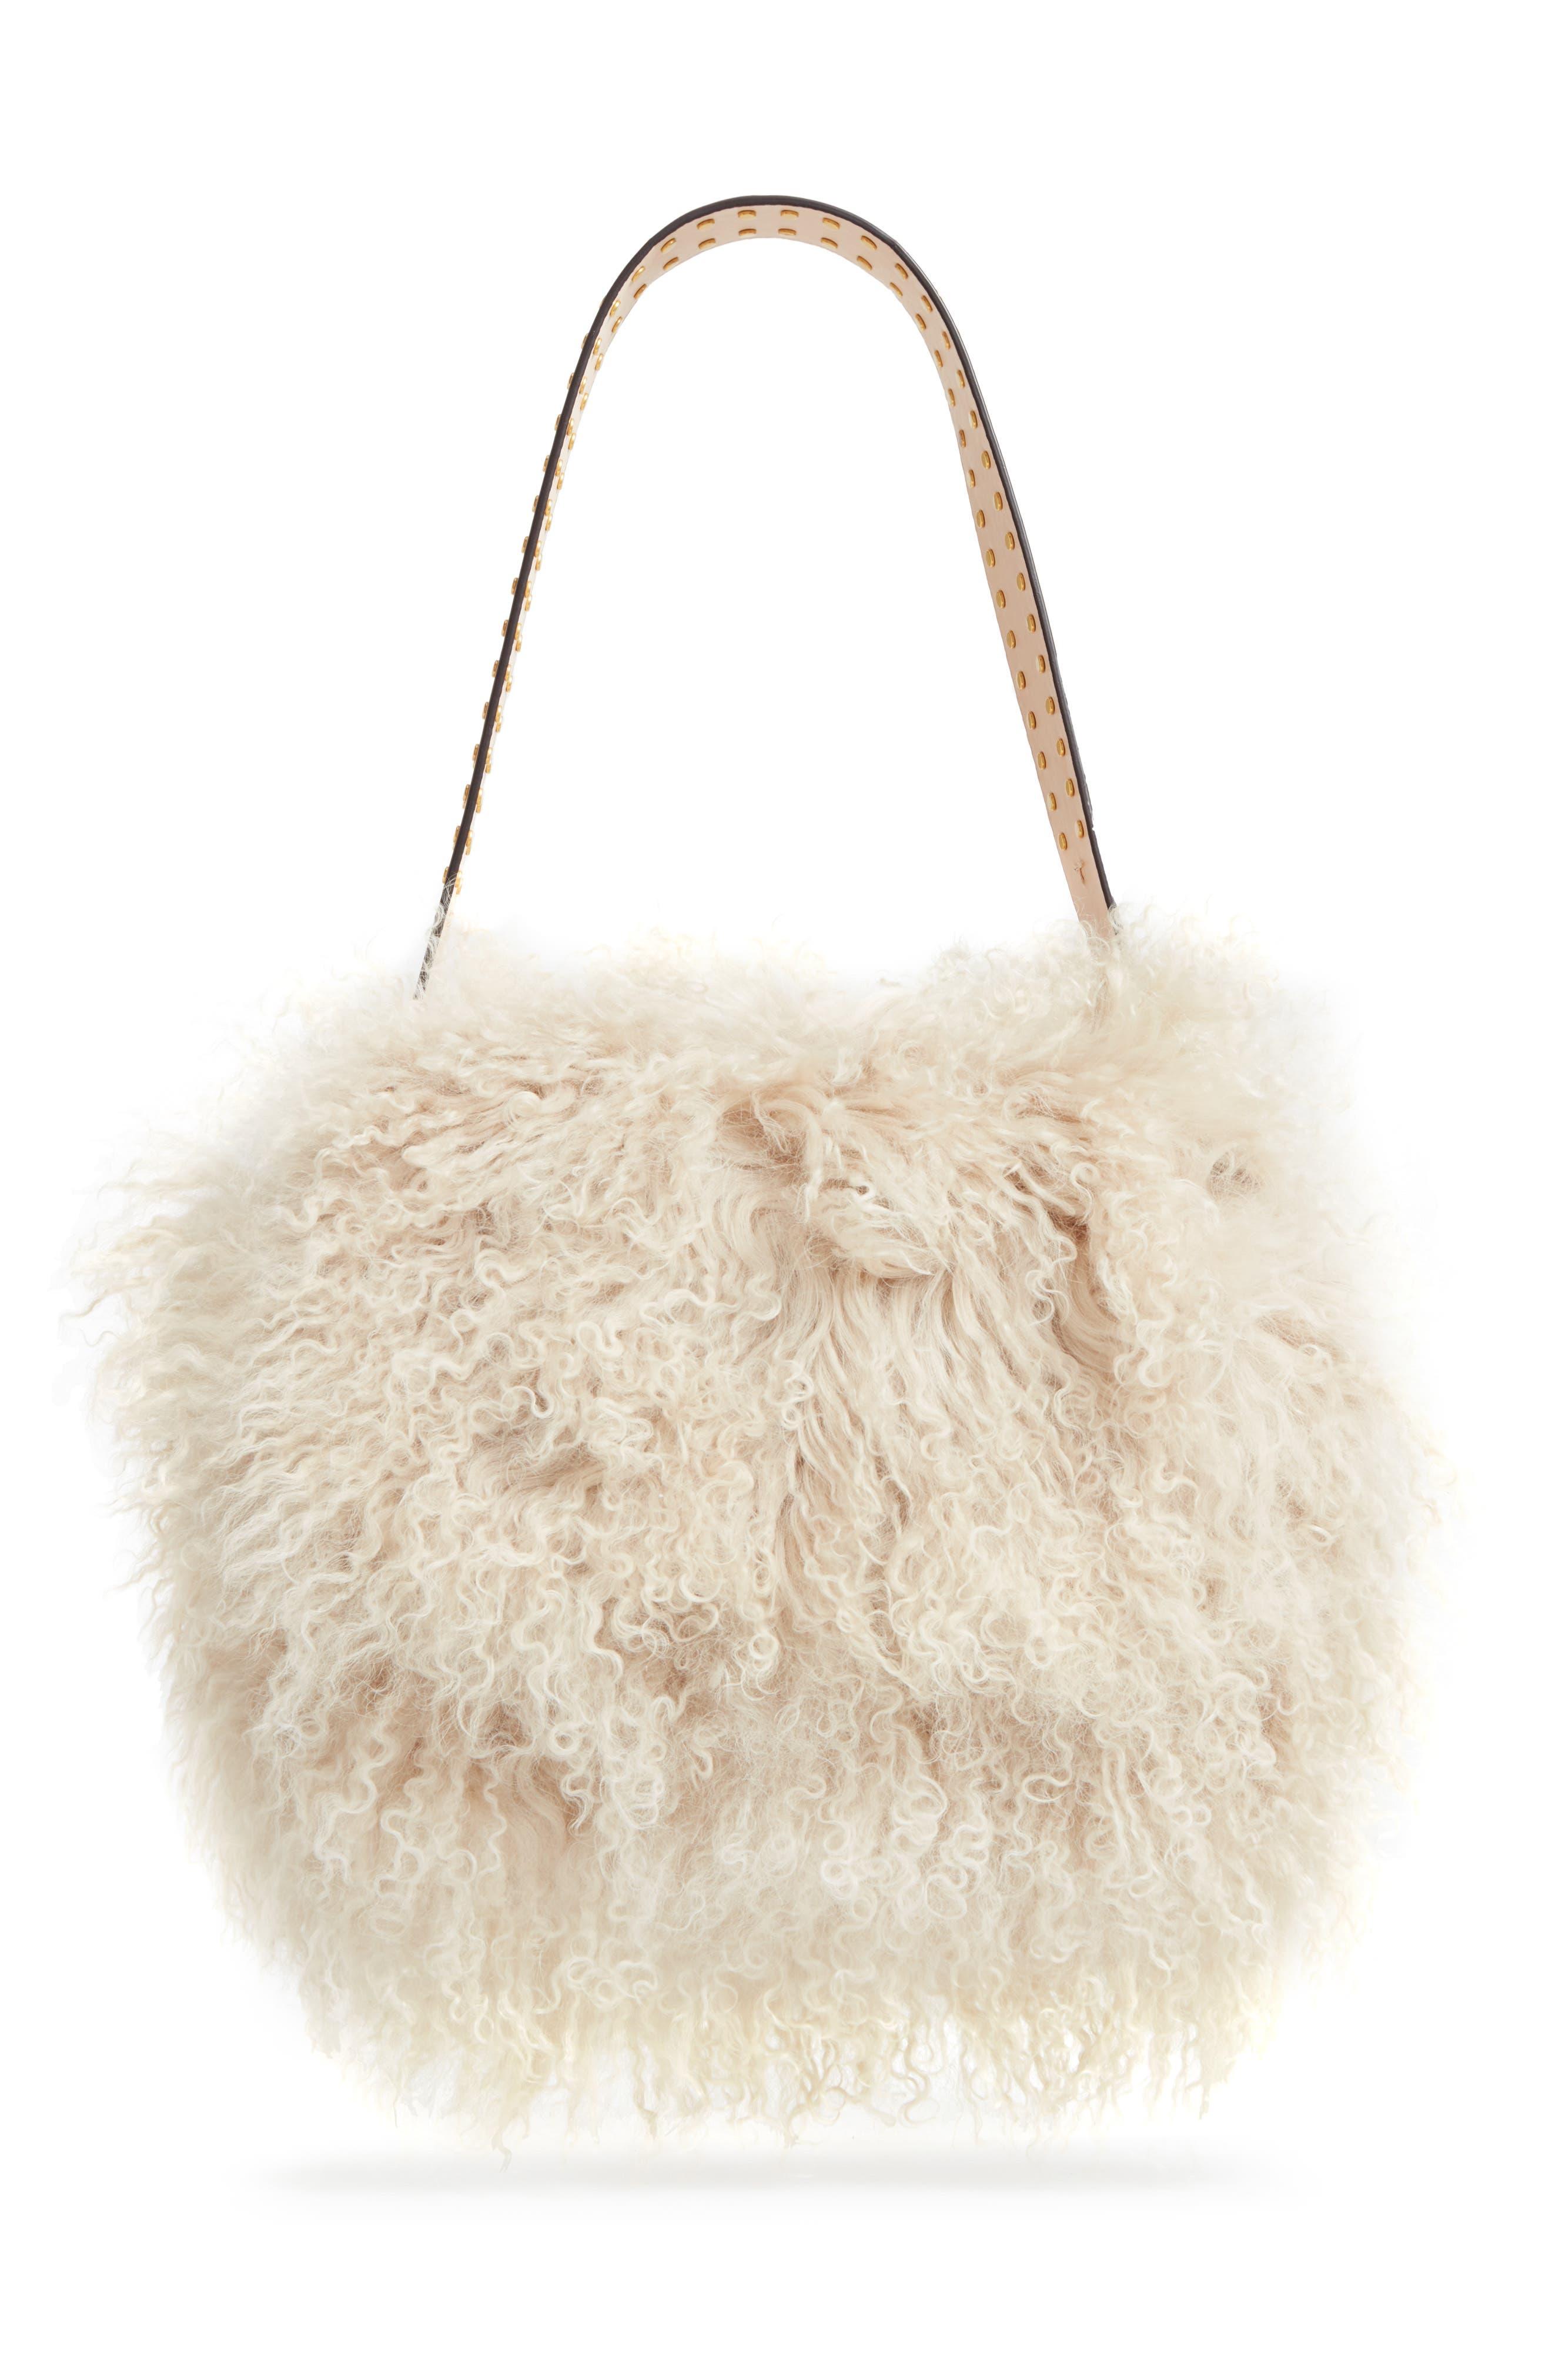 Tory Burch Sawyer Genuine Shearling Shoulder Bag